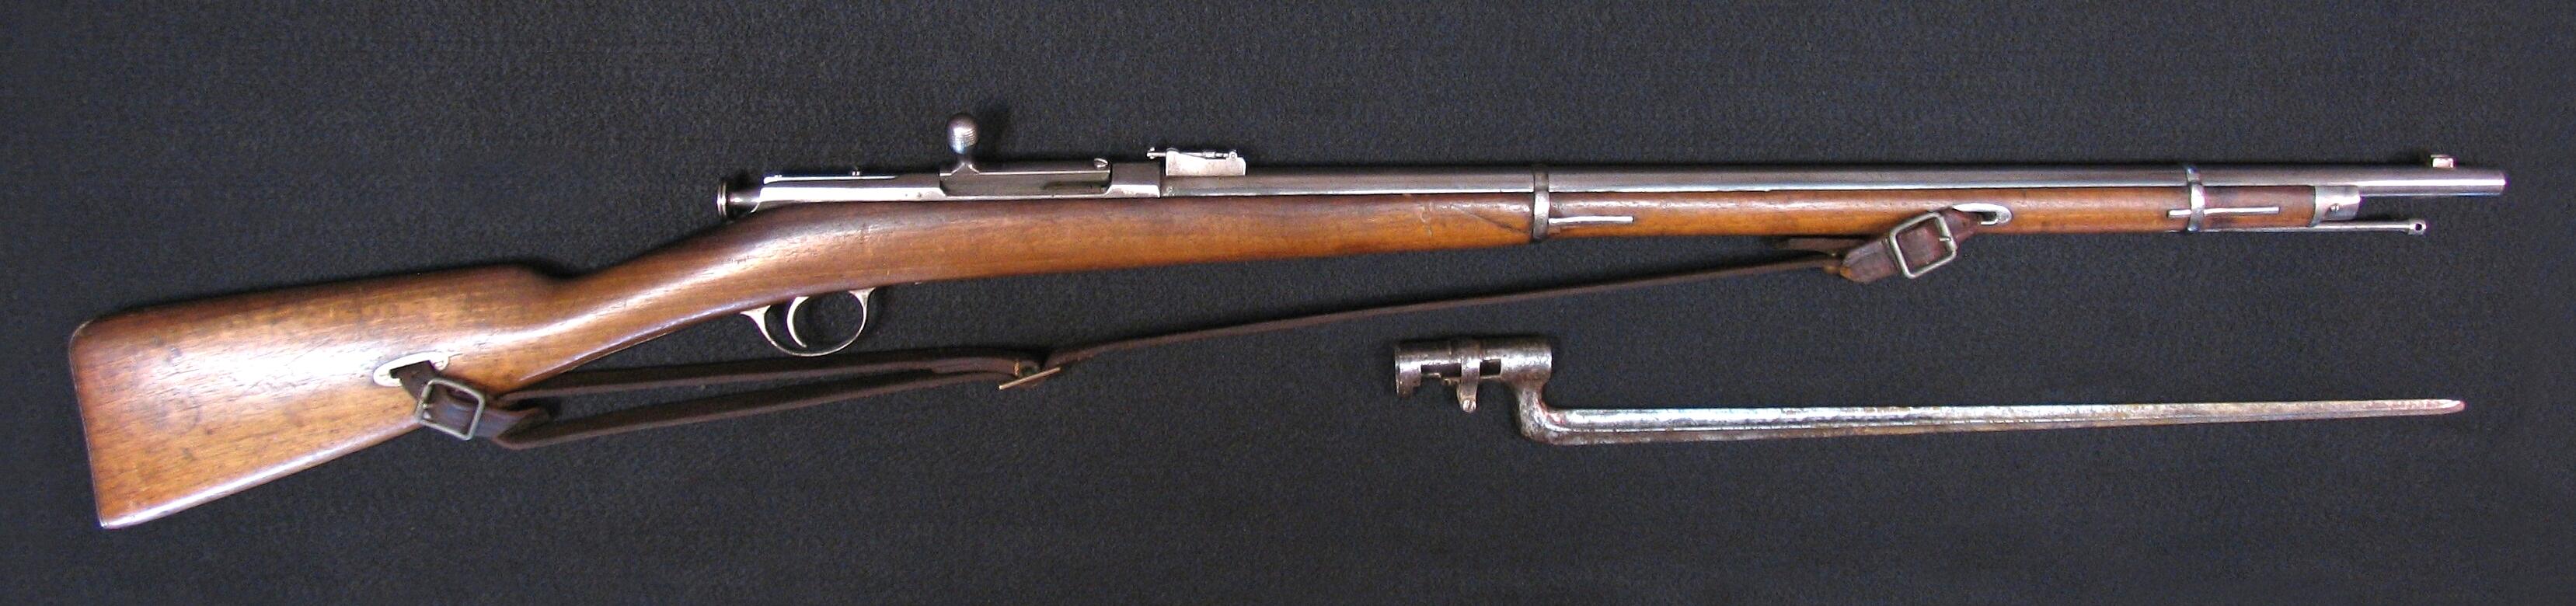 Click image for larger version.  Name:Russian M1870 Berdan II Dragoon Rifle w Bayo R-7A.jpg Views:4 Size:1.75 MB ID:2309554